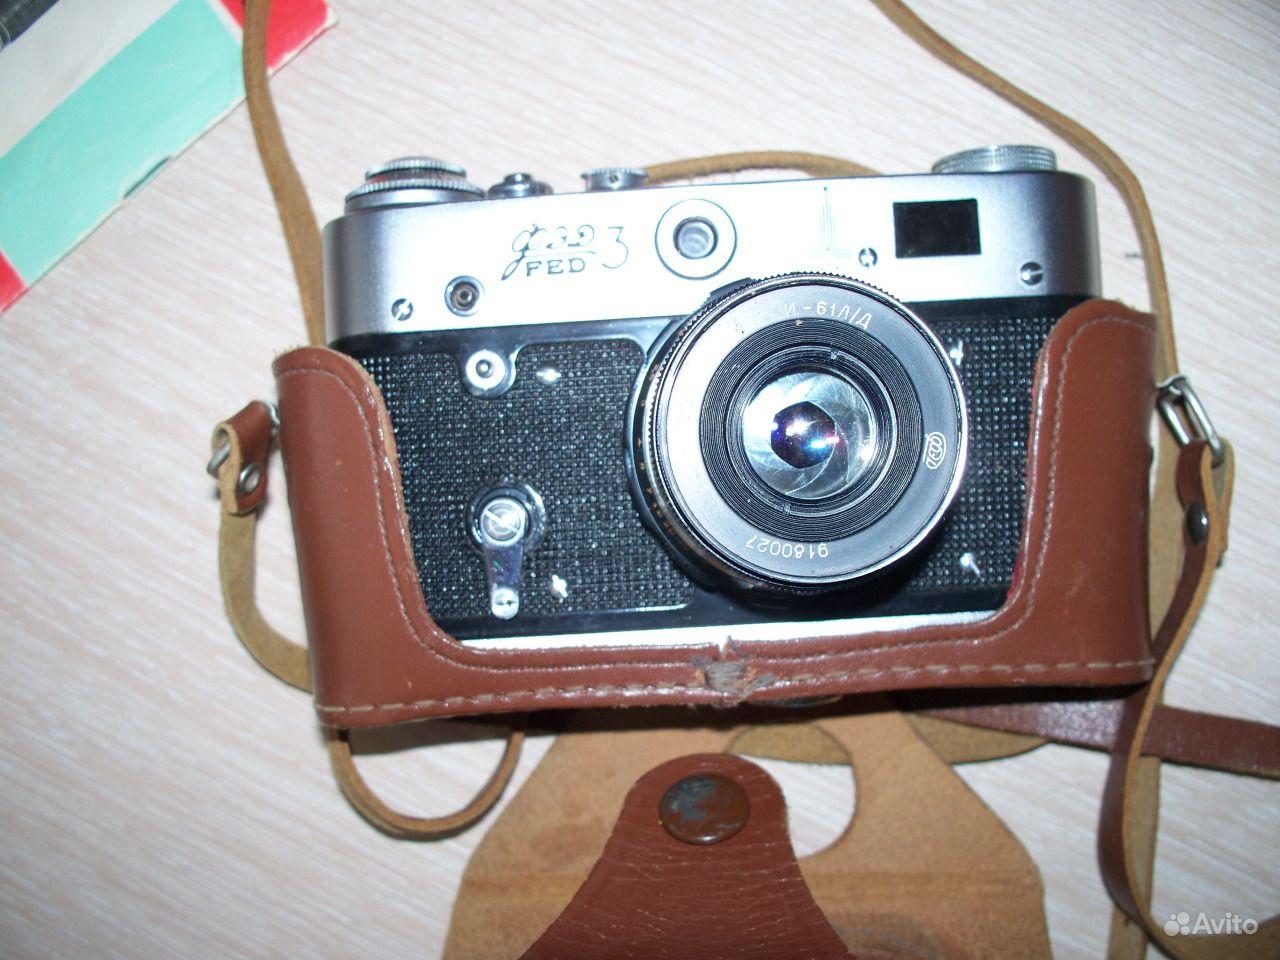 Фотоаппараты самсунг все модели кто хотел